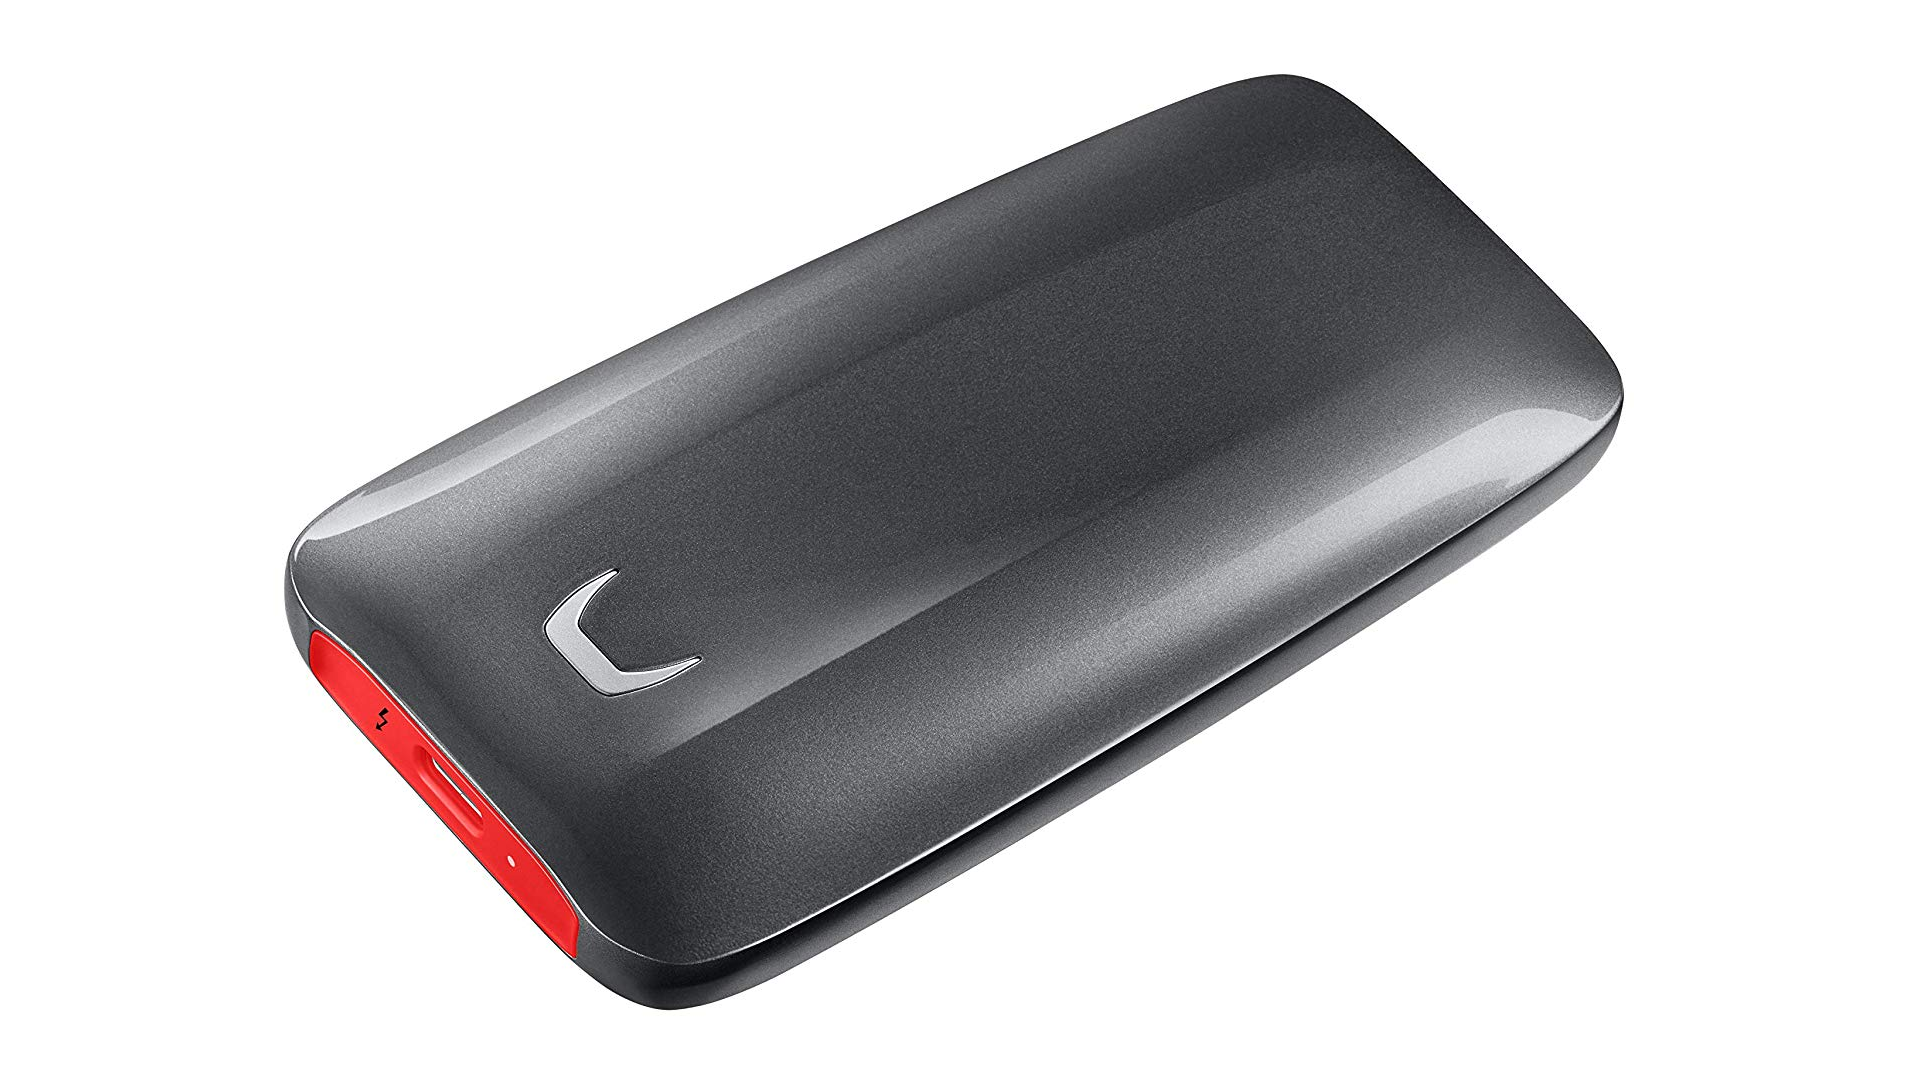 The Samsung X5 portable SSD.